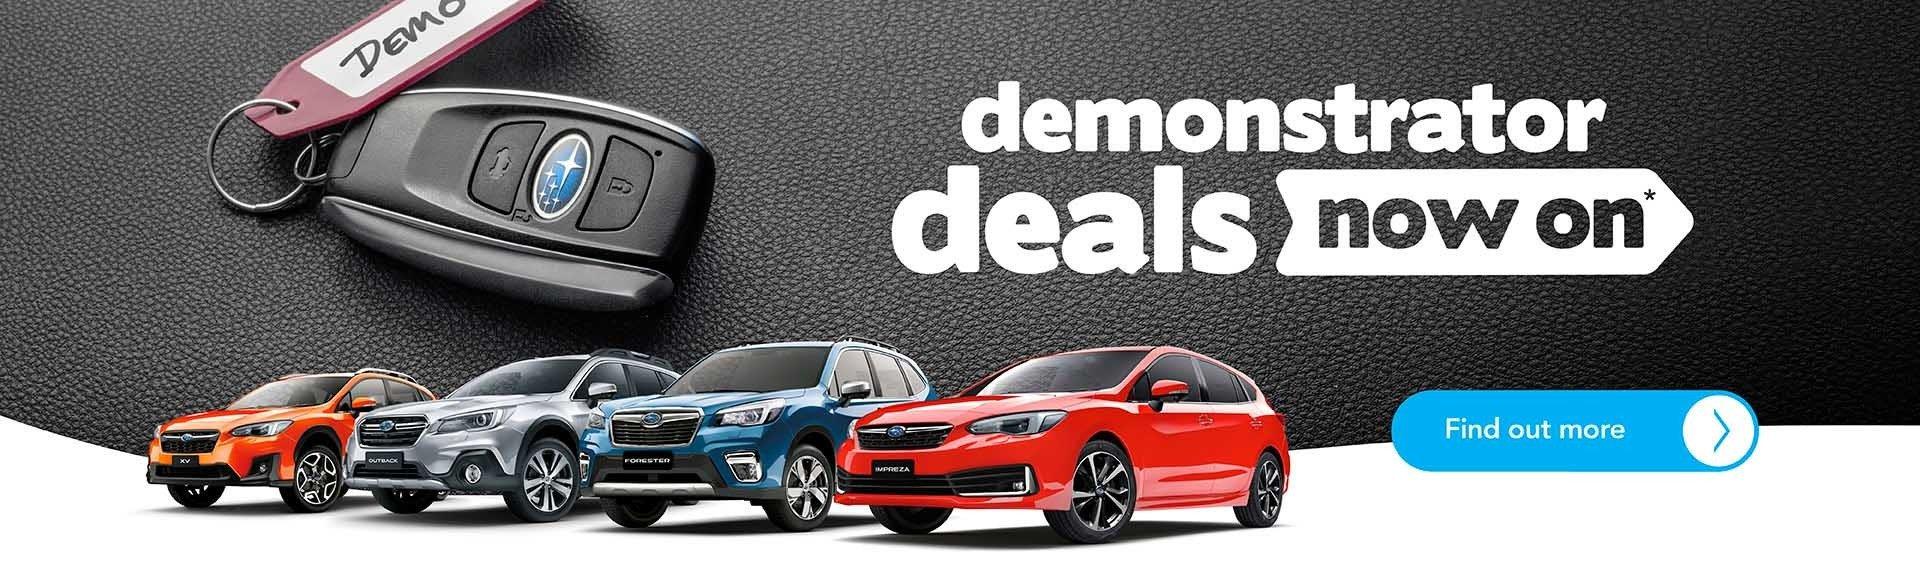 Subaru Essendon - Demonstrator Sale on now